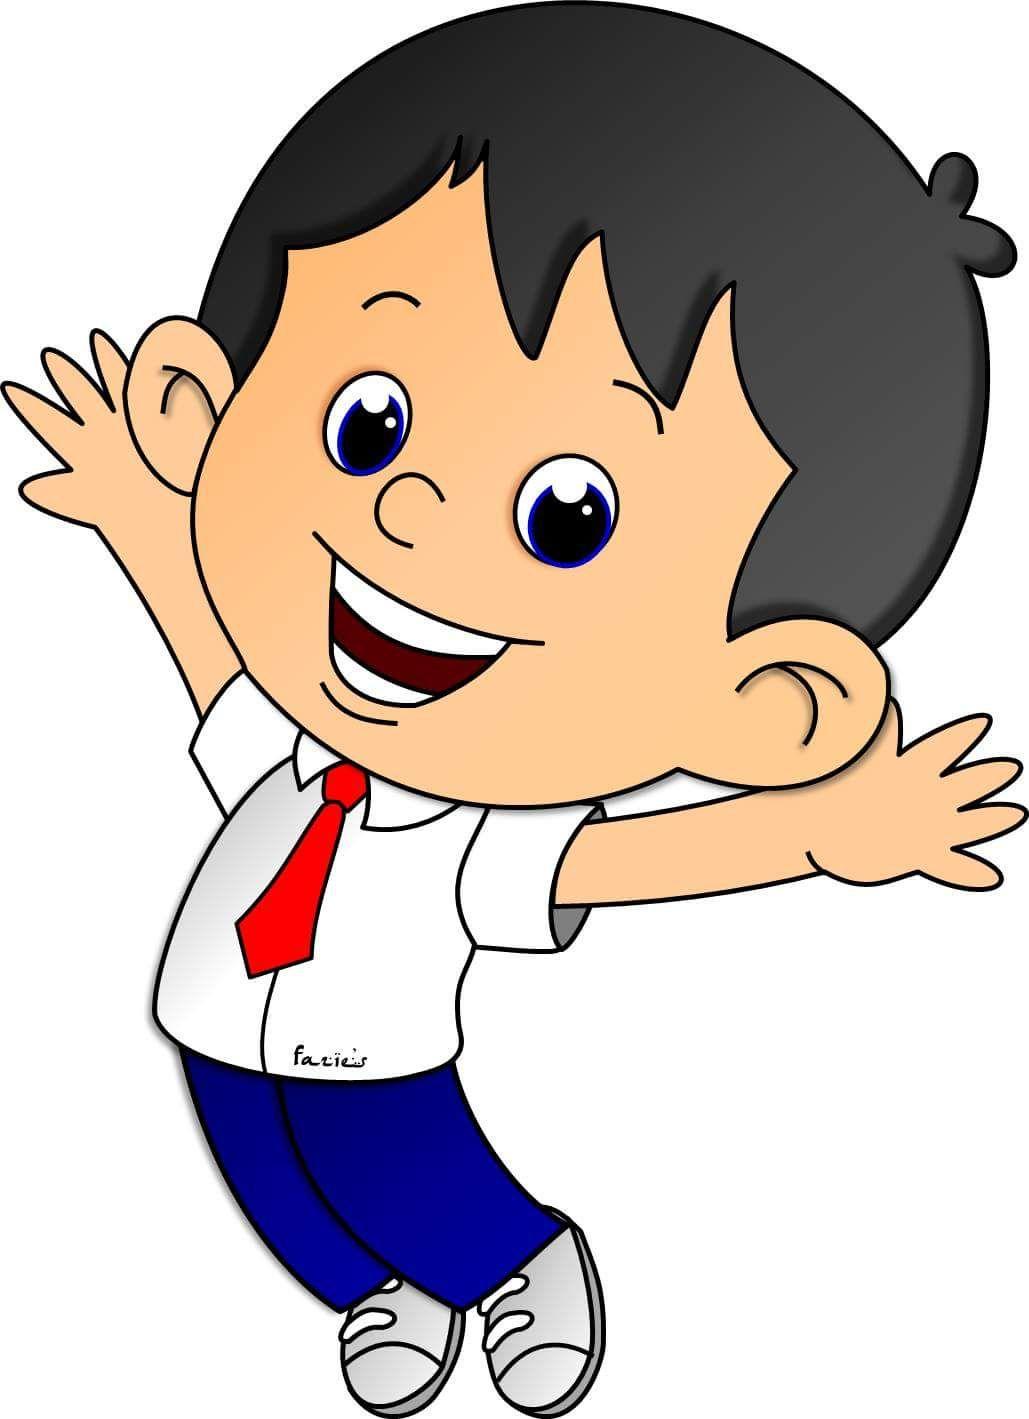 Kid Drawing Clipart : drawing, clipart, 13308501_1323179007698971_4519564147526659401_o.jpg, (1029×1419), Drawing, Kids,, Drawings, Doodles